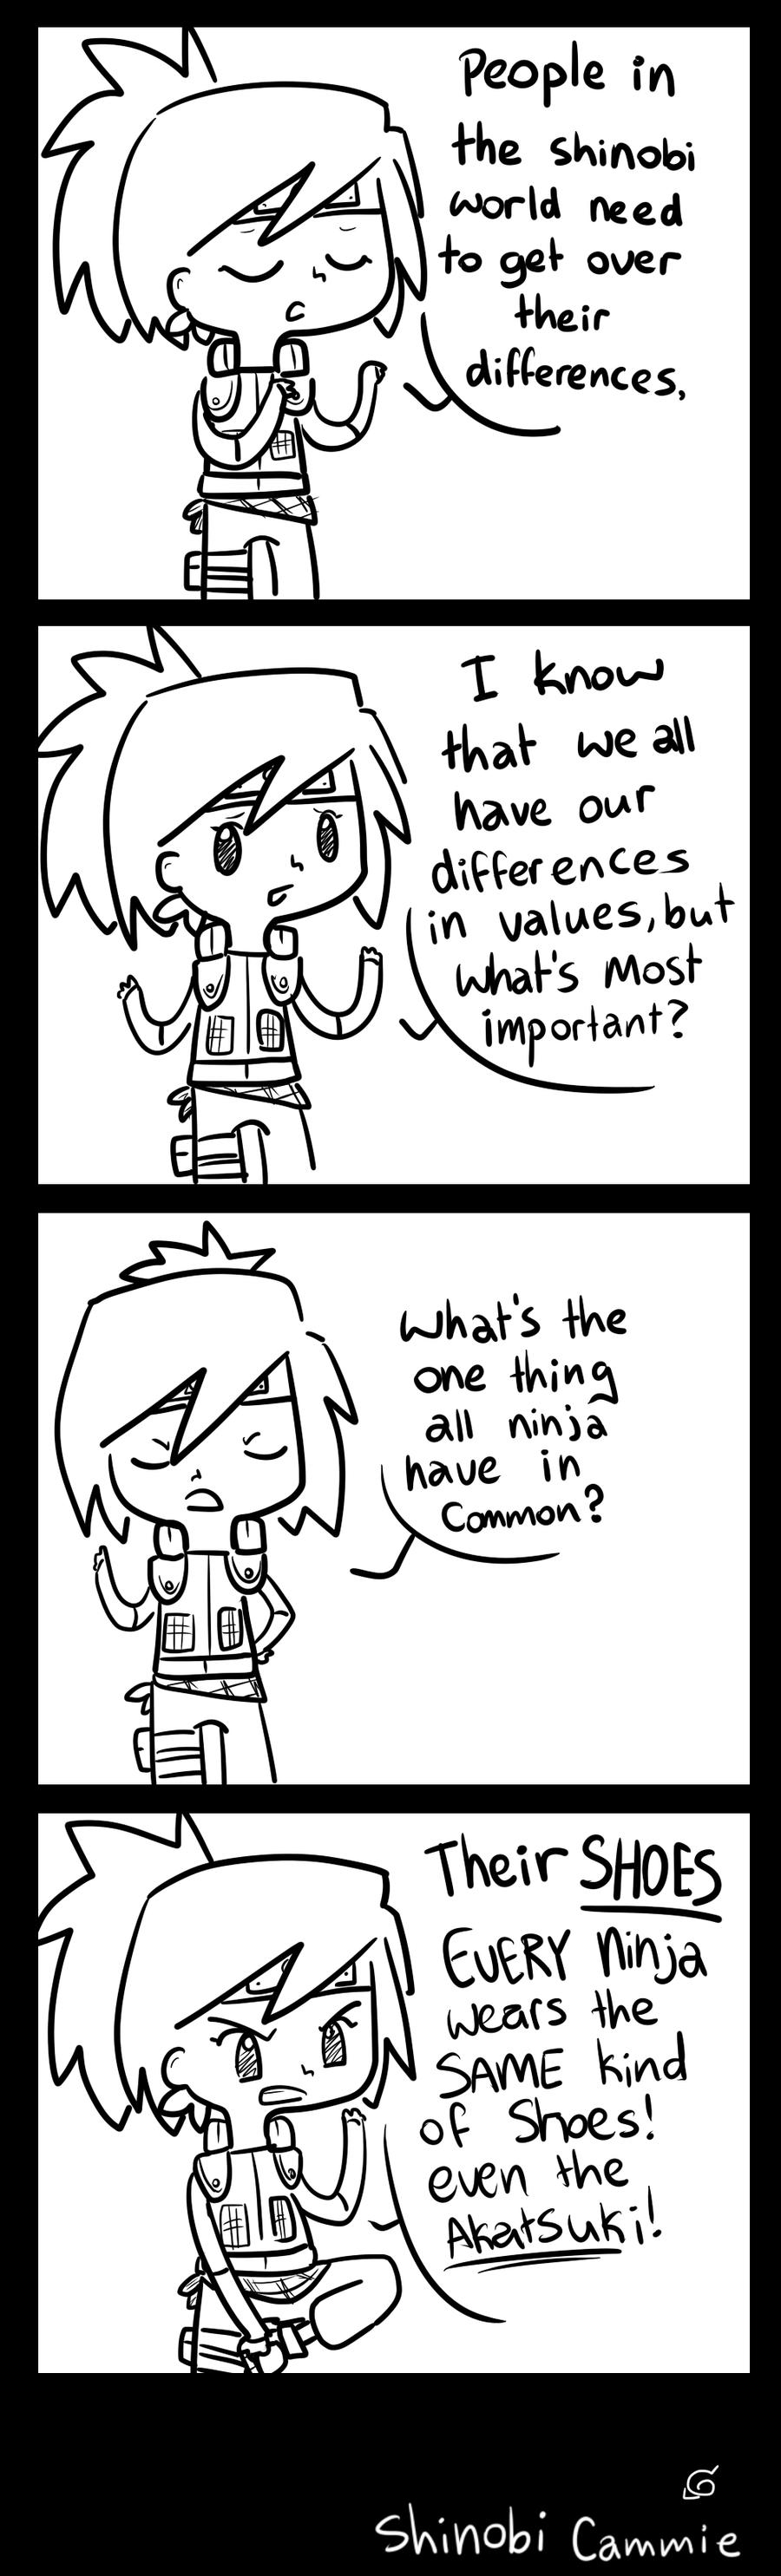 Shinobi problems by Caramelcat123